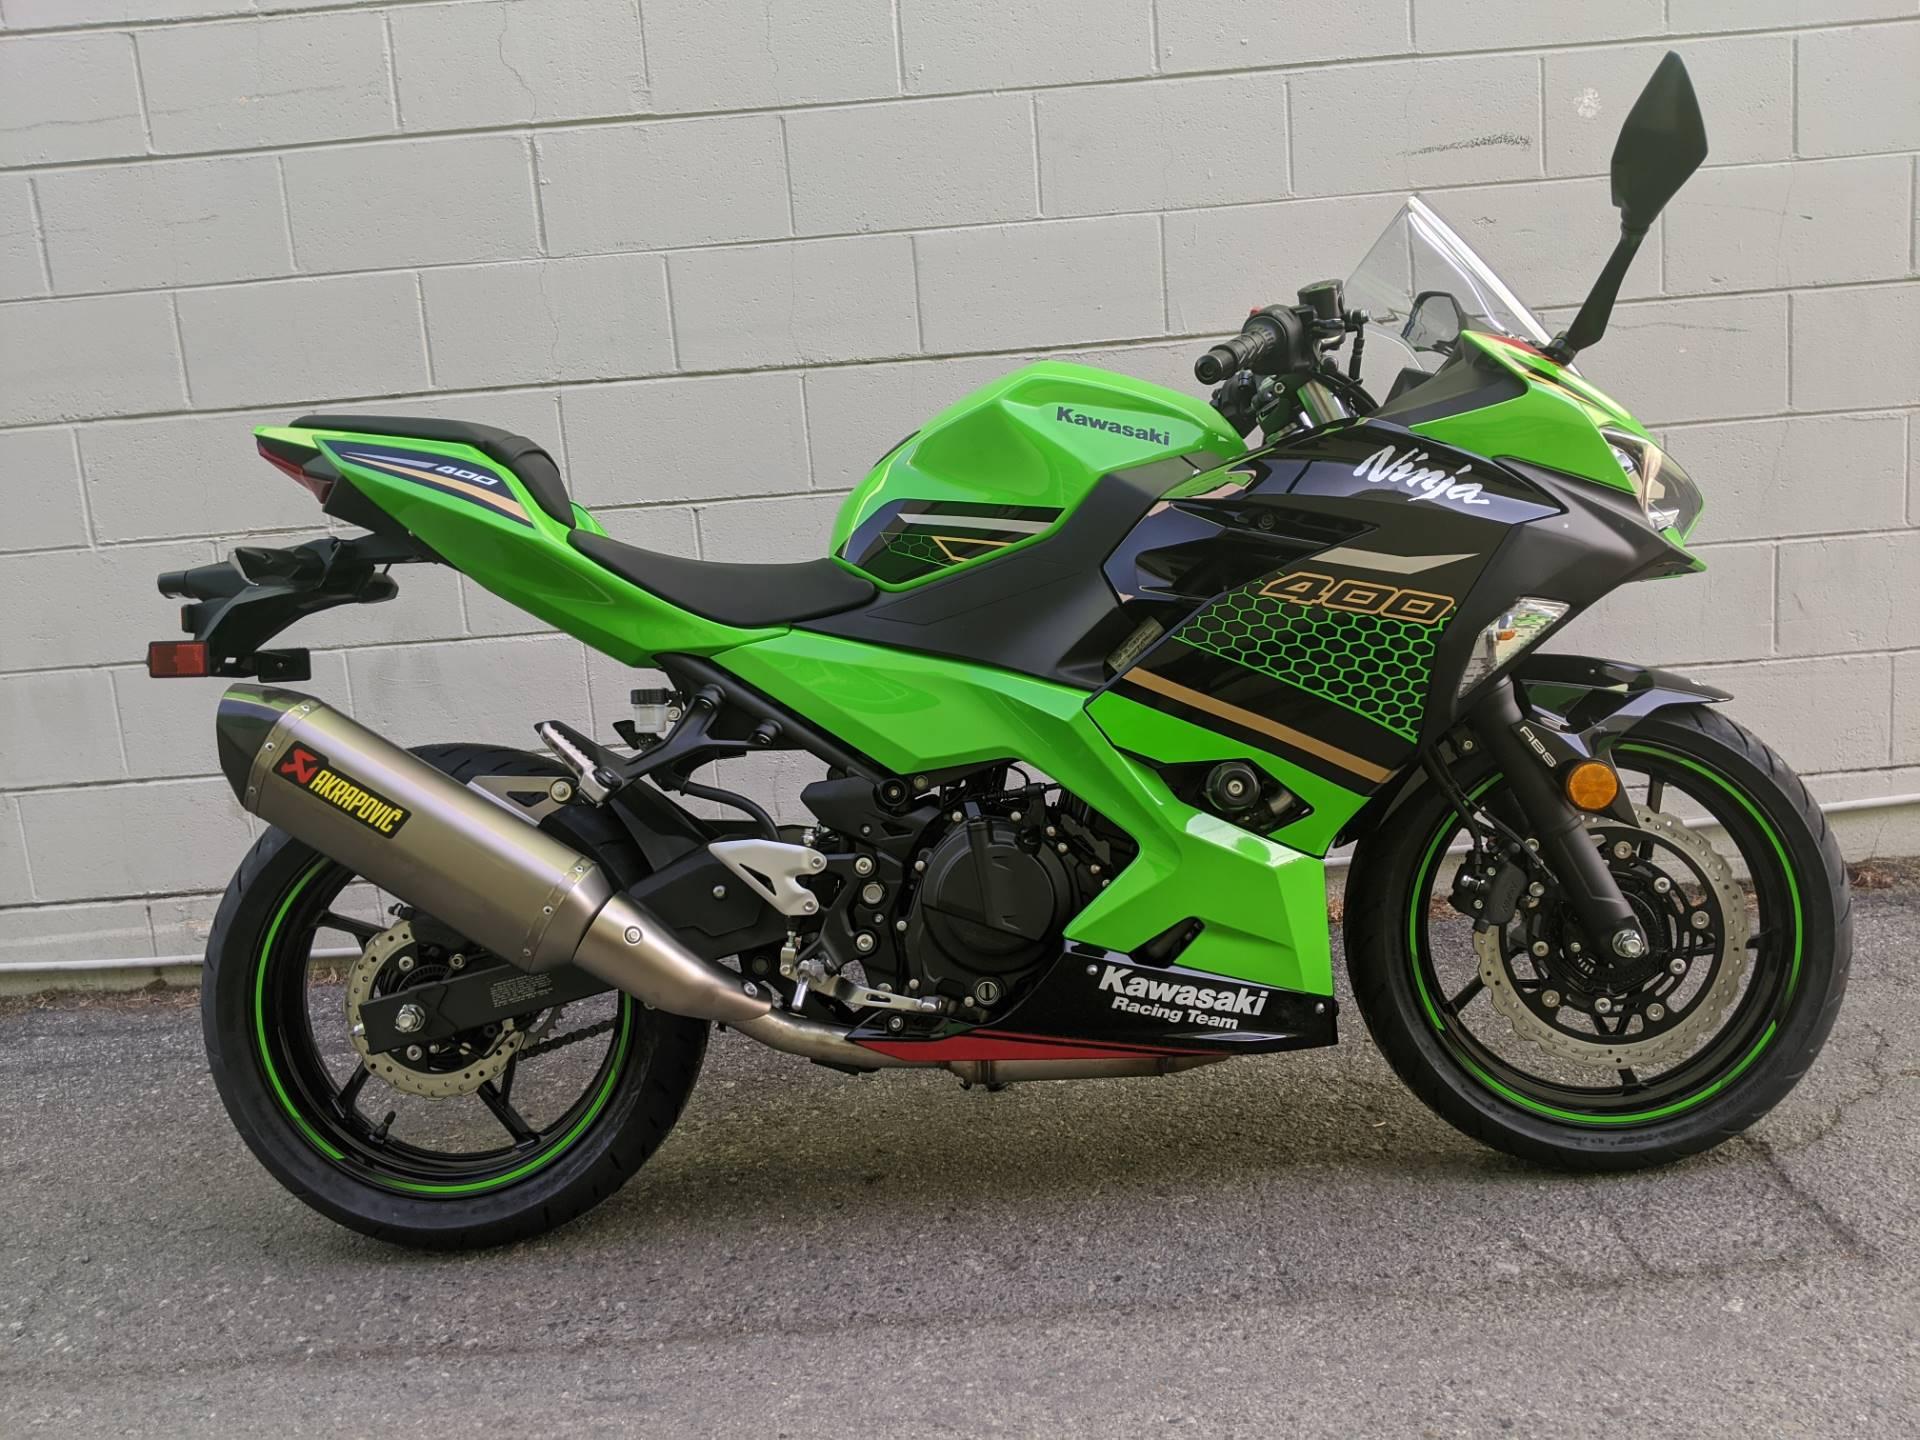 2020 Kawasaki Ninja 400 ABS KRT Edition for sale 235829